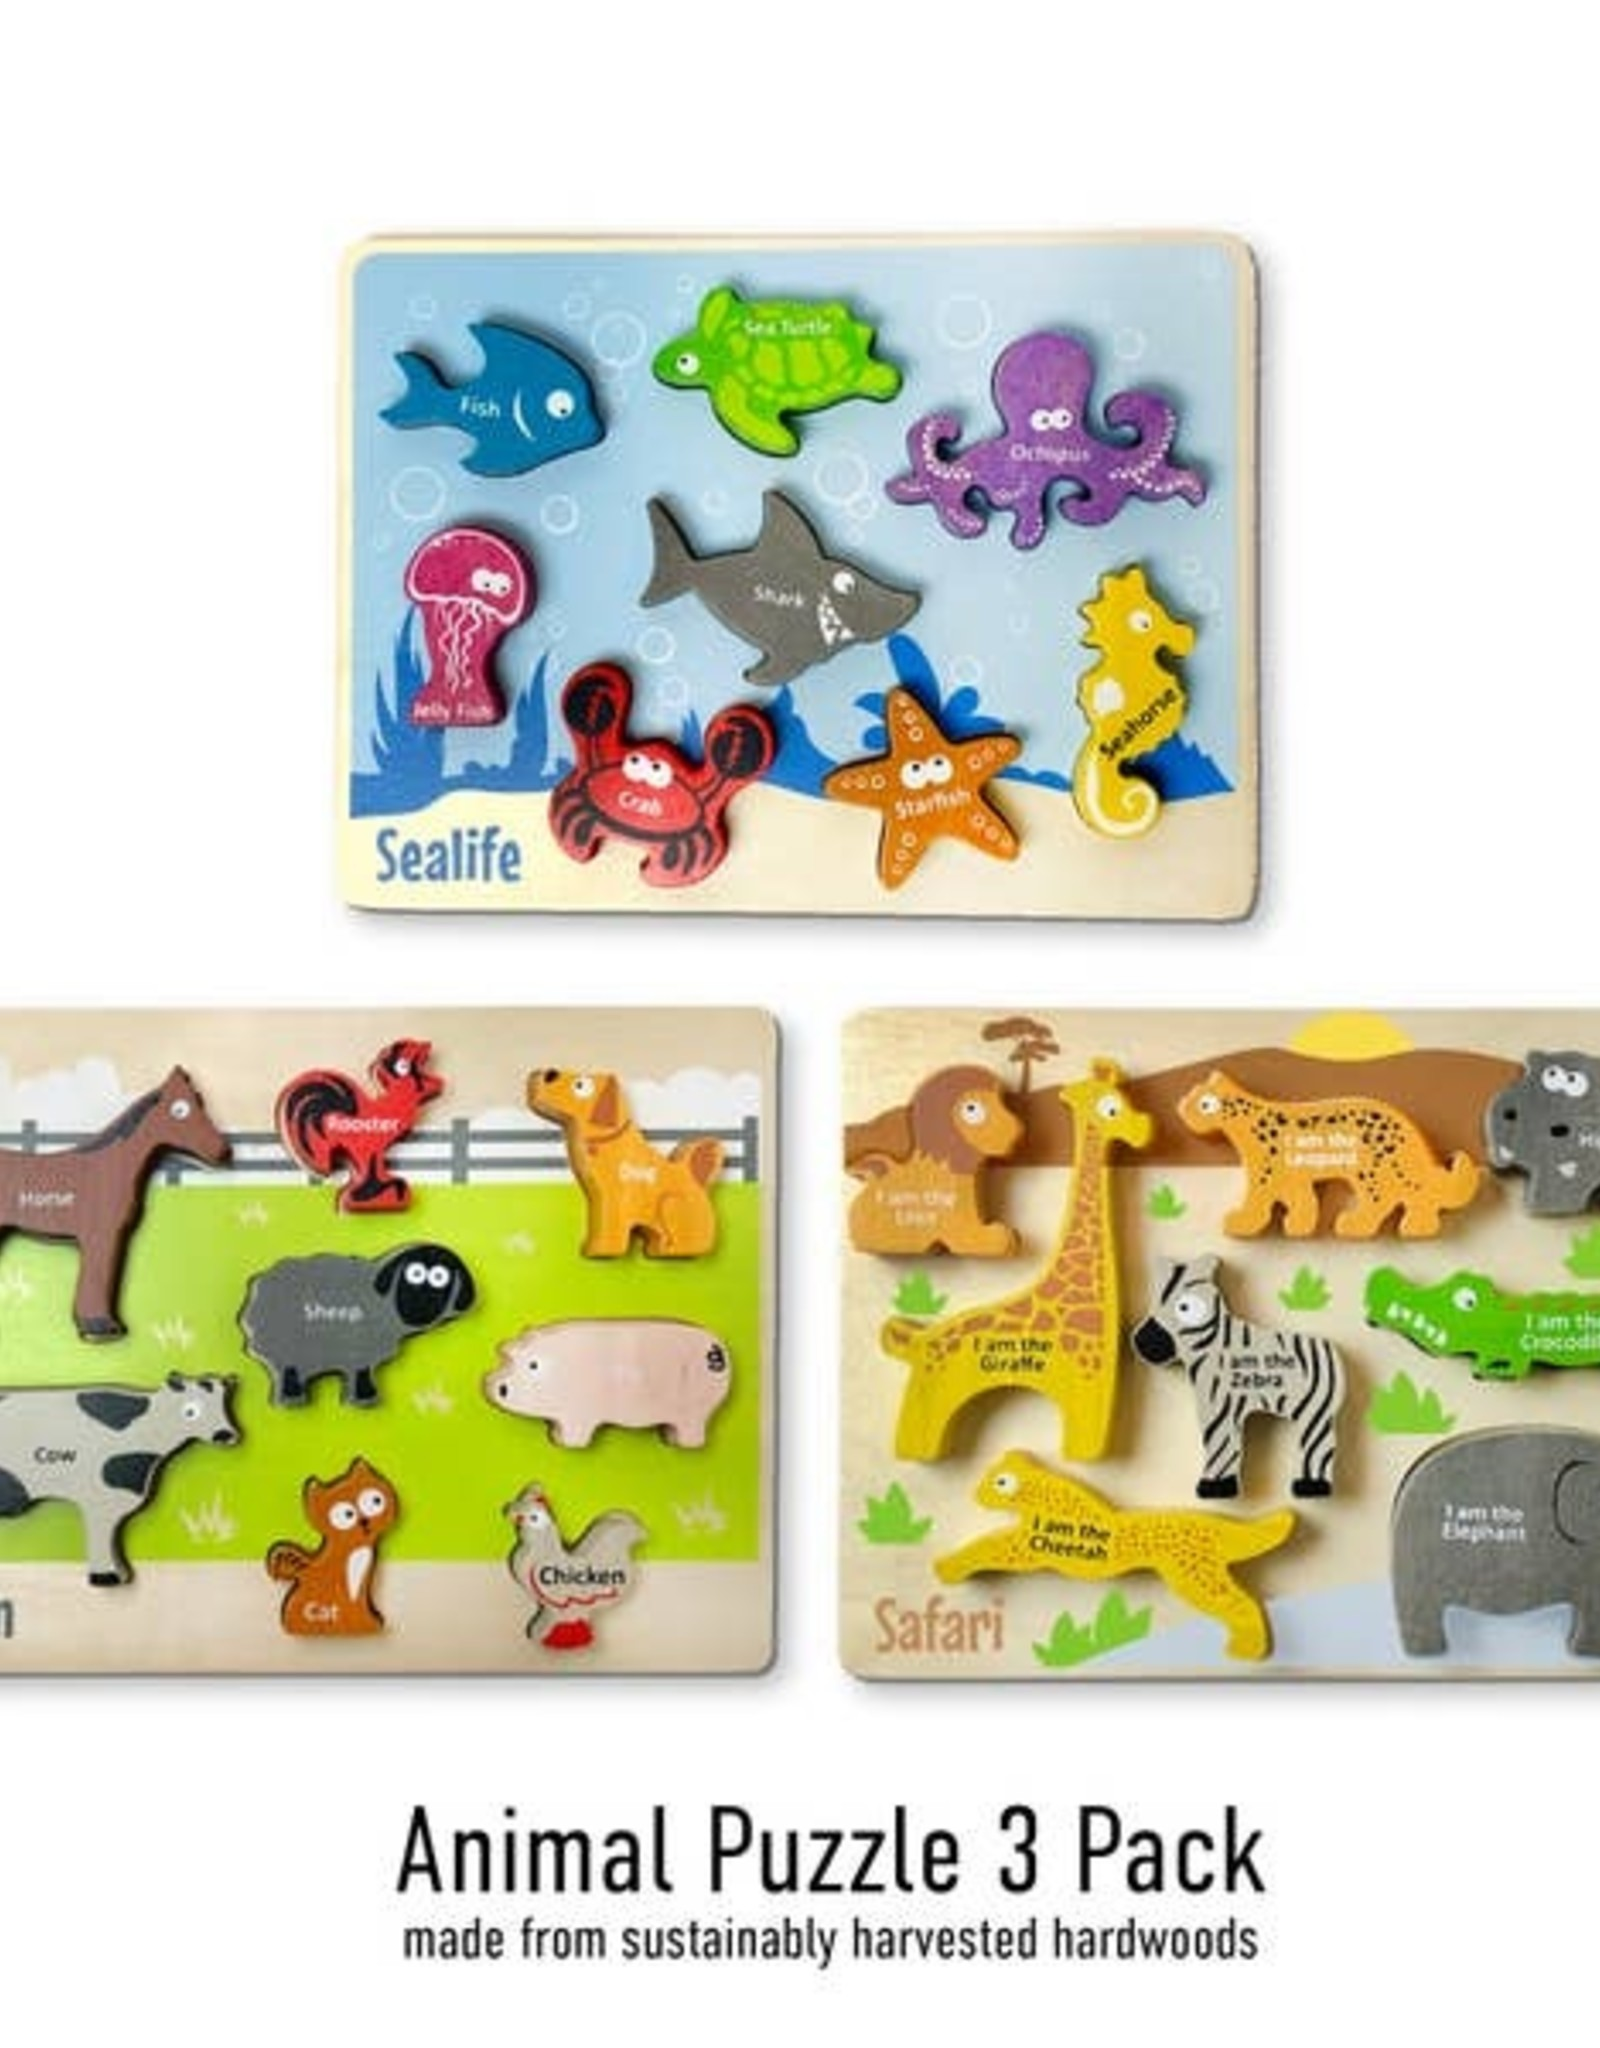 Begin Again Animal Puzzle 3 Pack